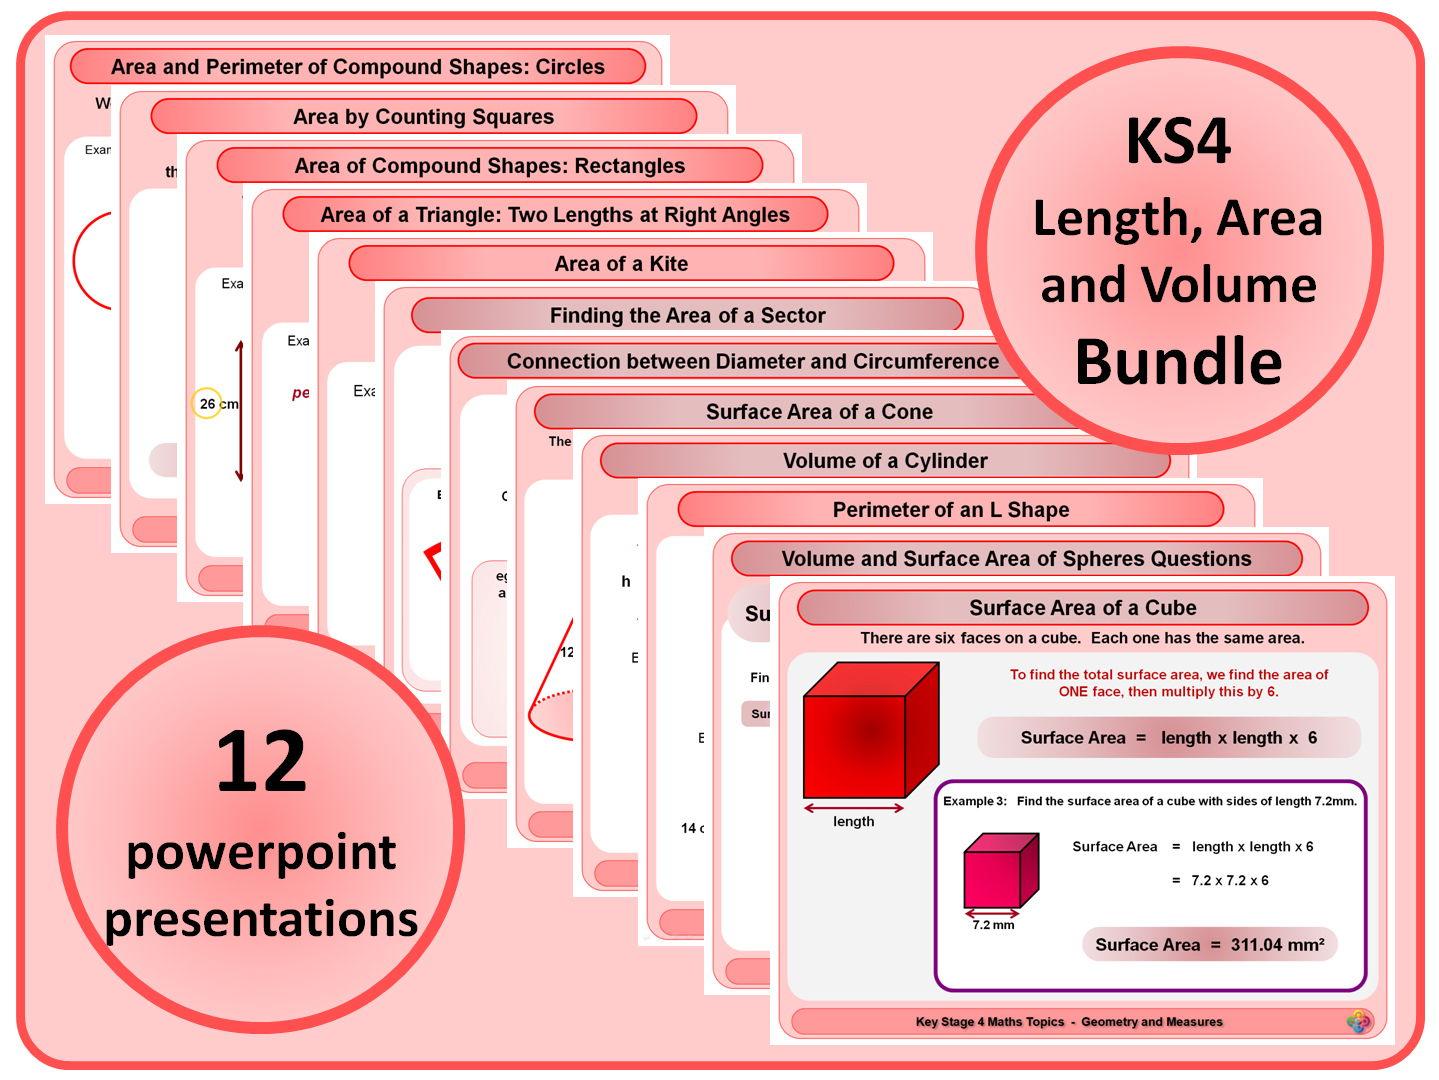 Ks4 Length Area And Volume Bundle